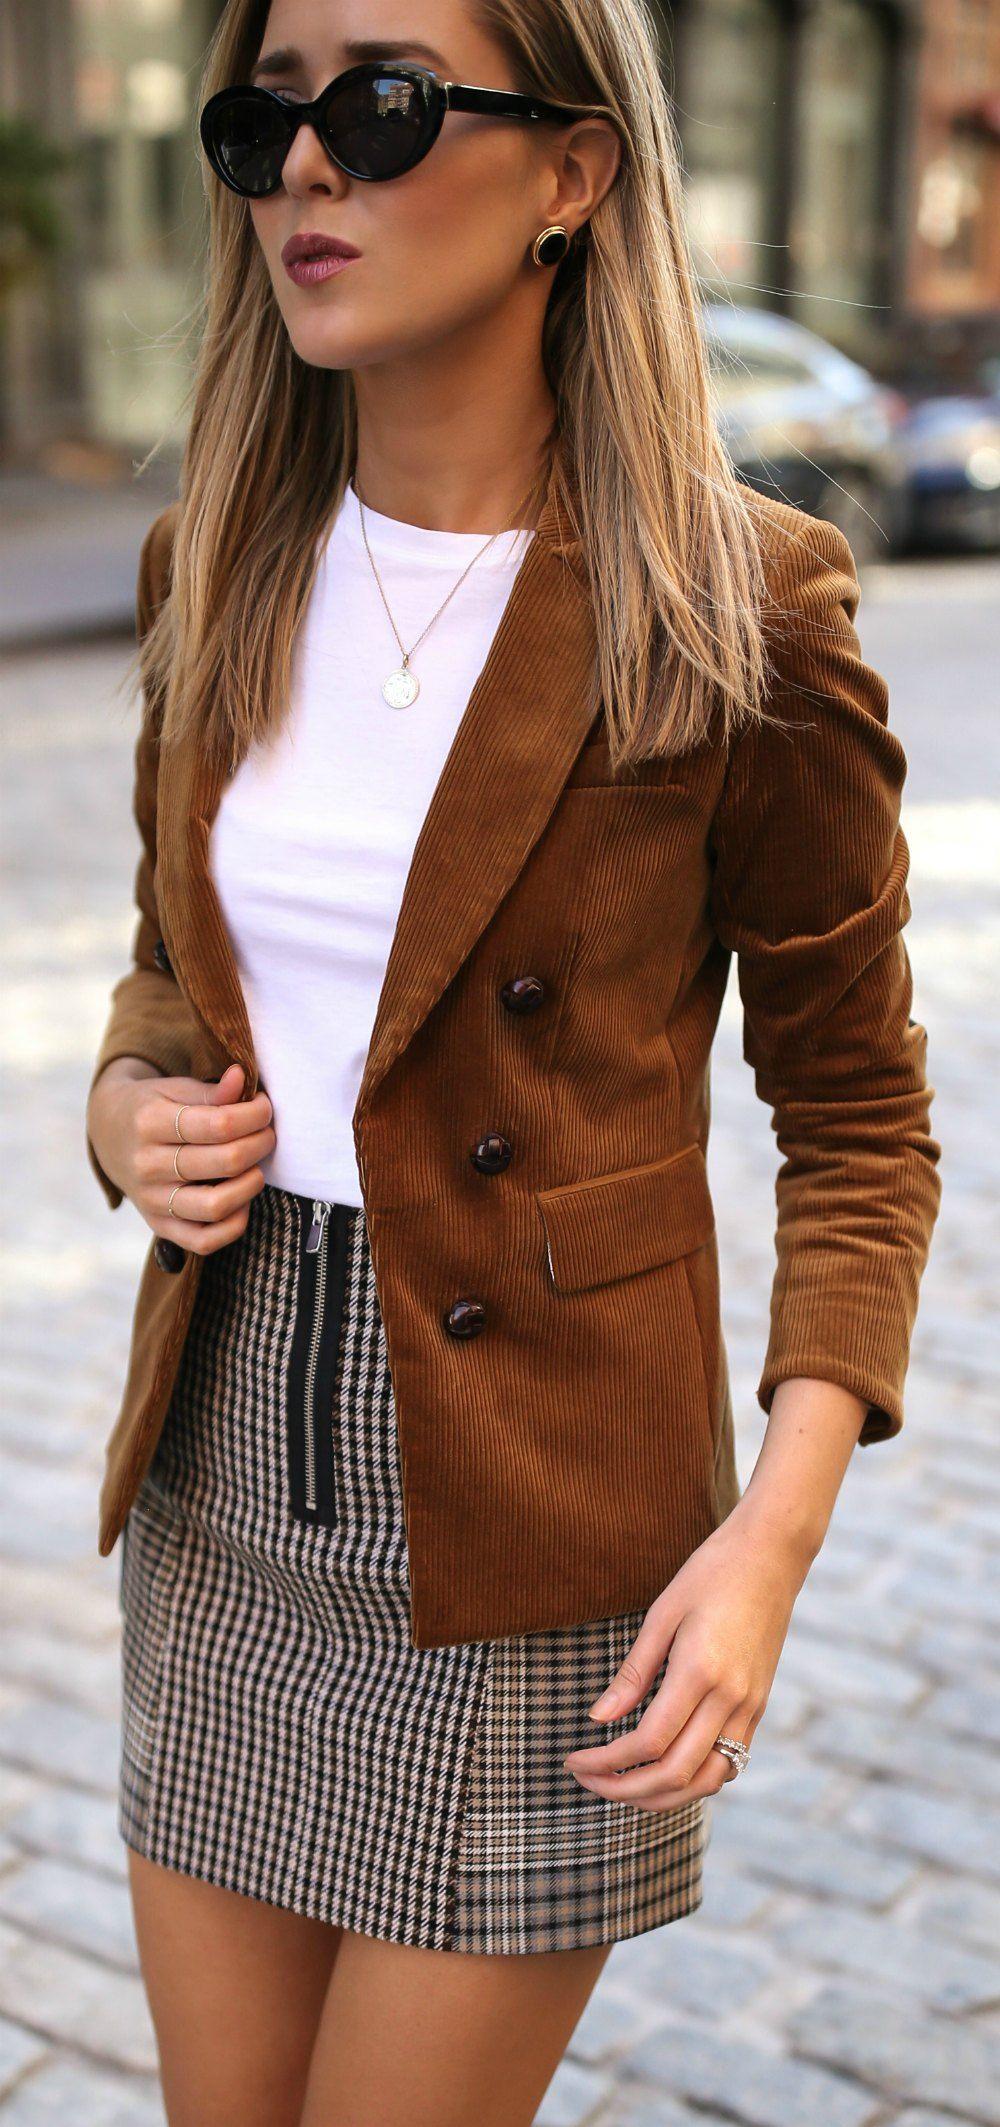 Click for outfit details! // Corduroy jacket, white short sleeve t-shirt, checked mini skirt, leopard print pumps {Veronica Beard, J Brand, Maje, trend memo, fashion week, fall fashion}